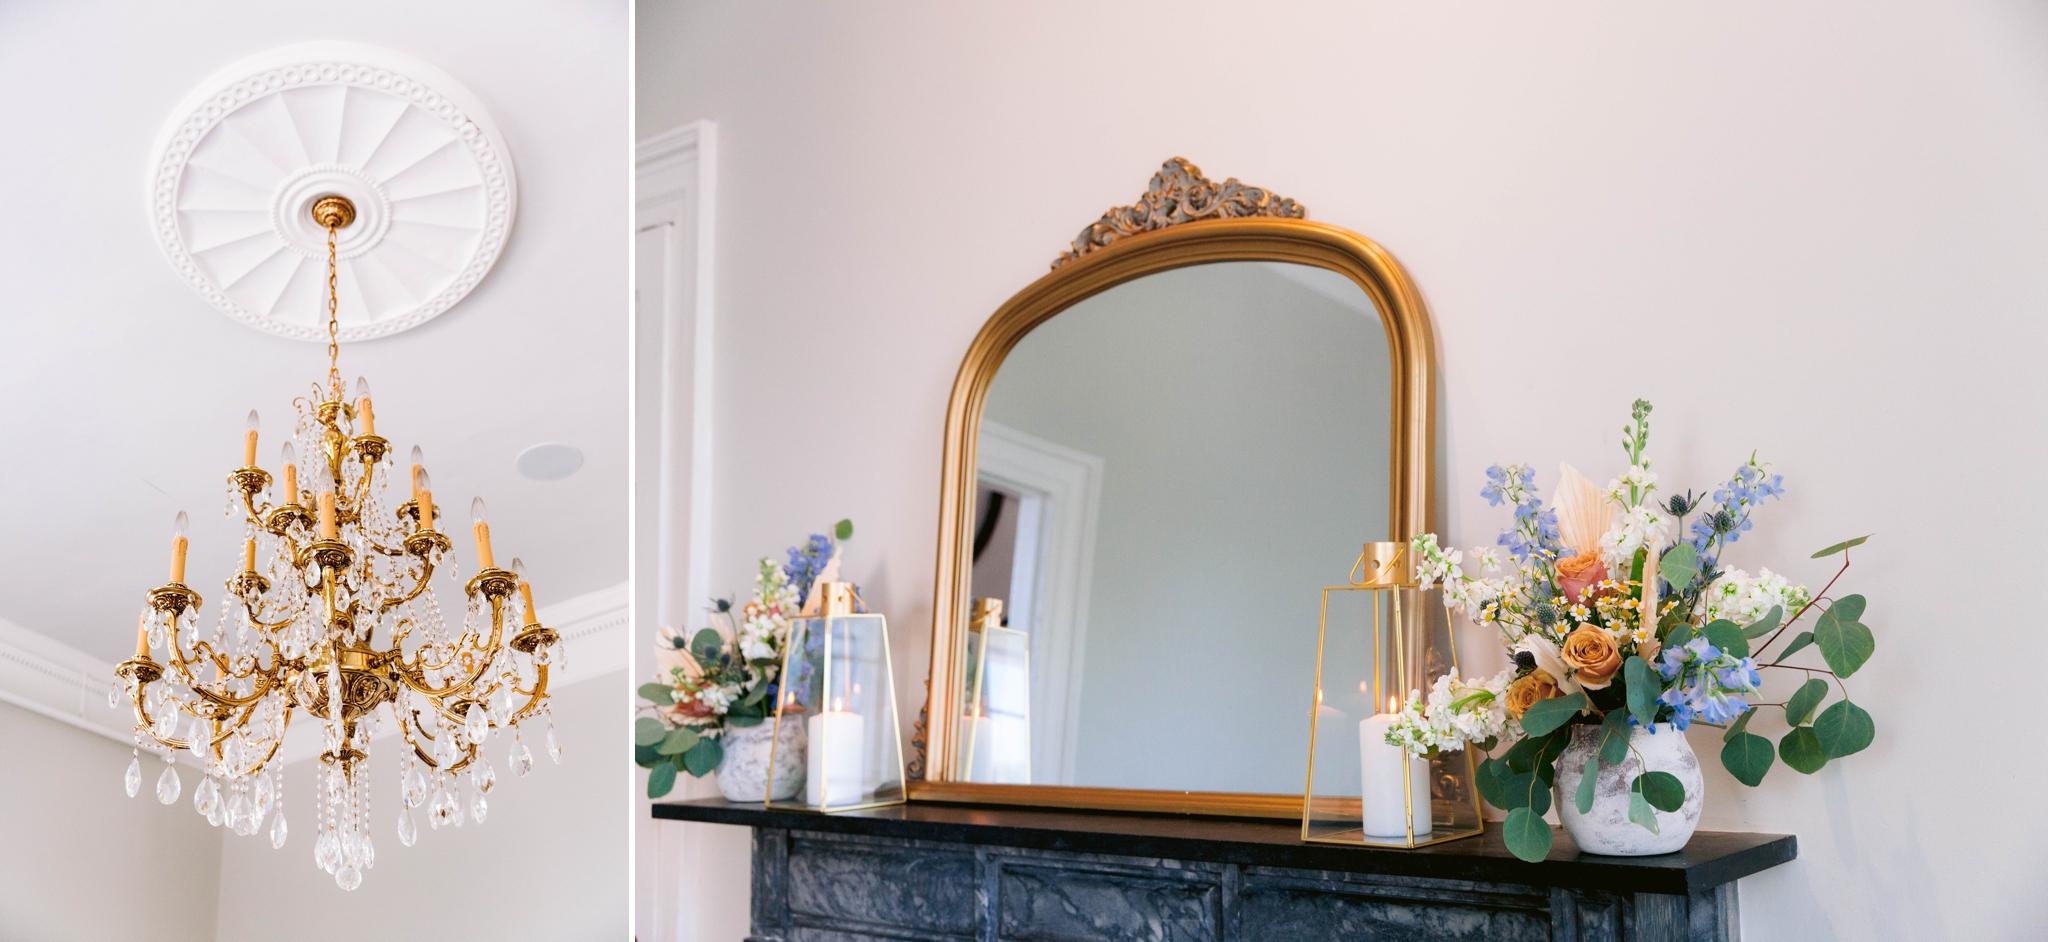 Gorgeous gold chandelier and marble fireplace - Wedding Table Set up with white and blue tablecloth, white and pastel china and pastel flowers - martha stewart weddings - style me pretty - Dusty Blue Wedding Inspiration - fine art photography - Honolulu, Oahu, Hawaii Wedding Photographer - johanna dye